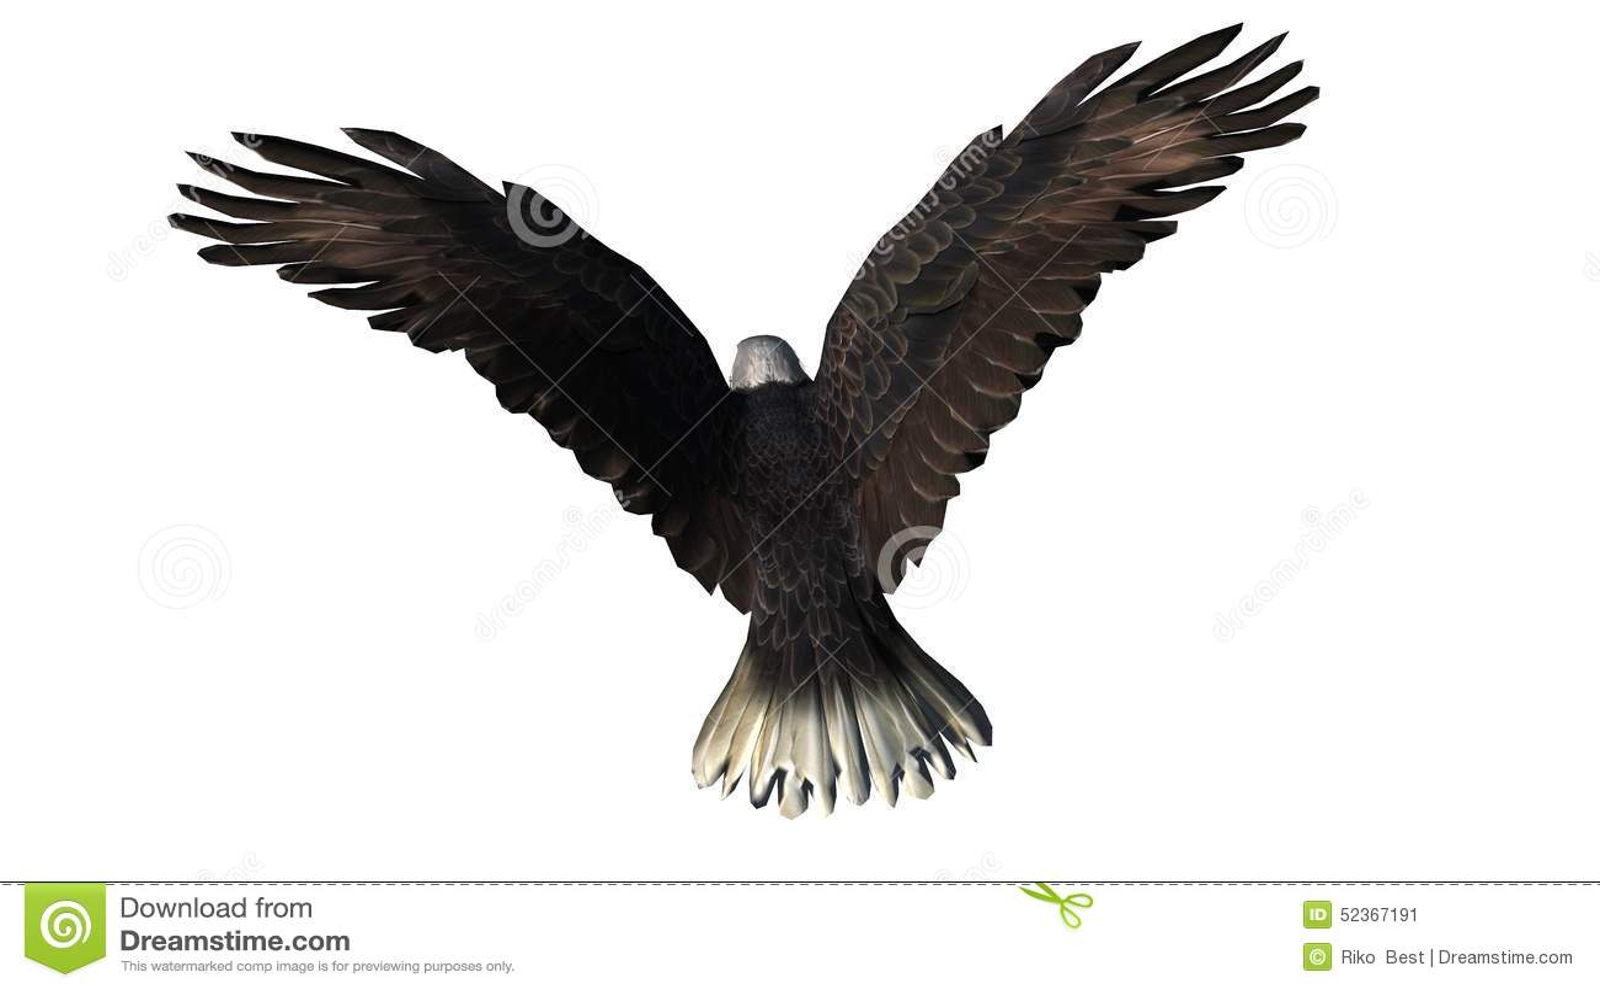 Eagle calvo in mosca - fondo bianco